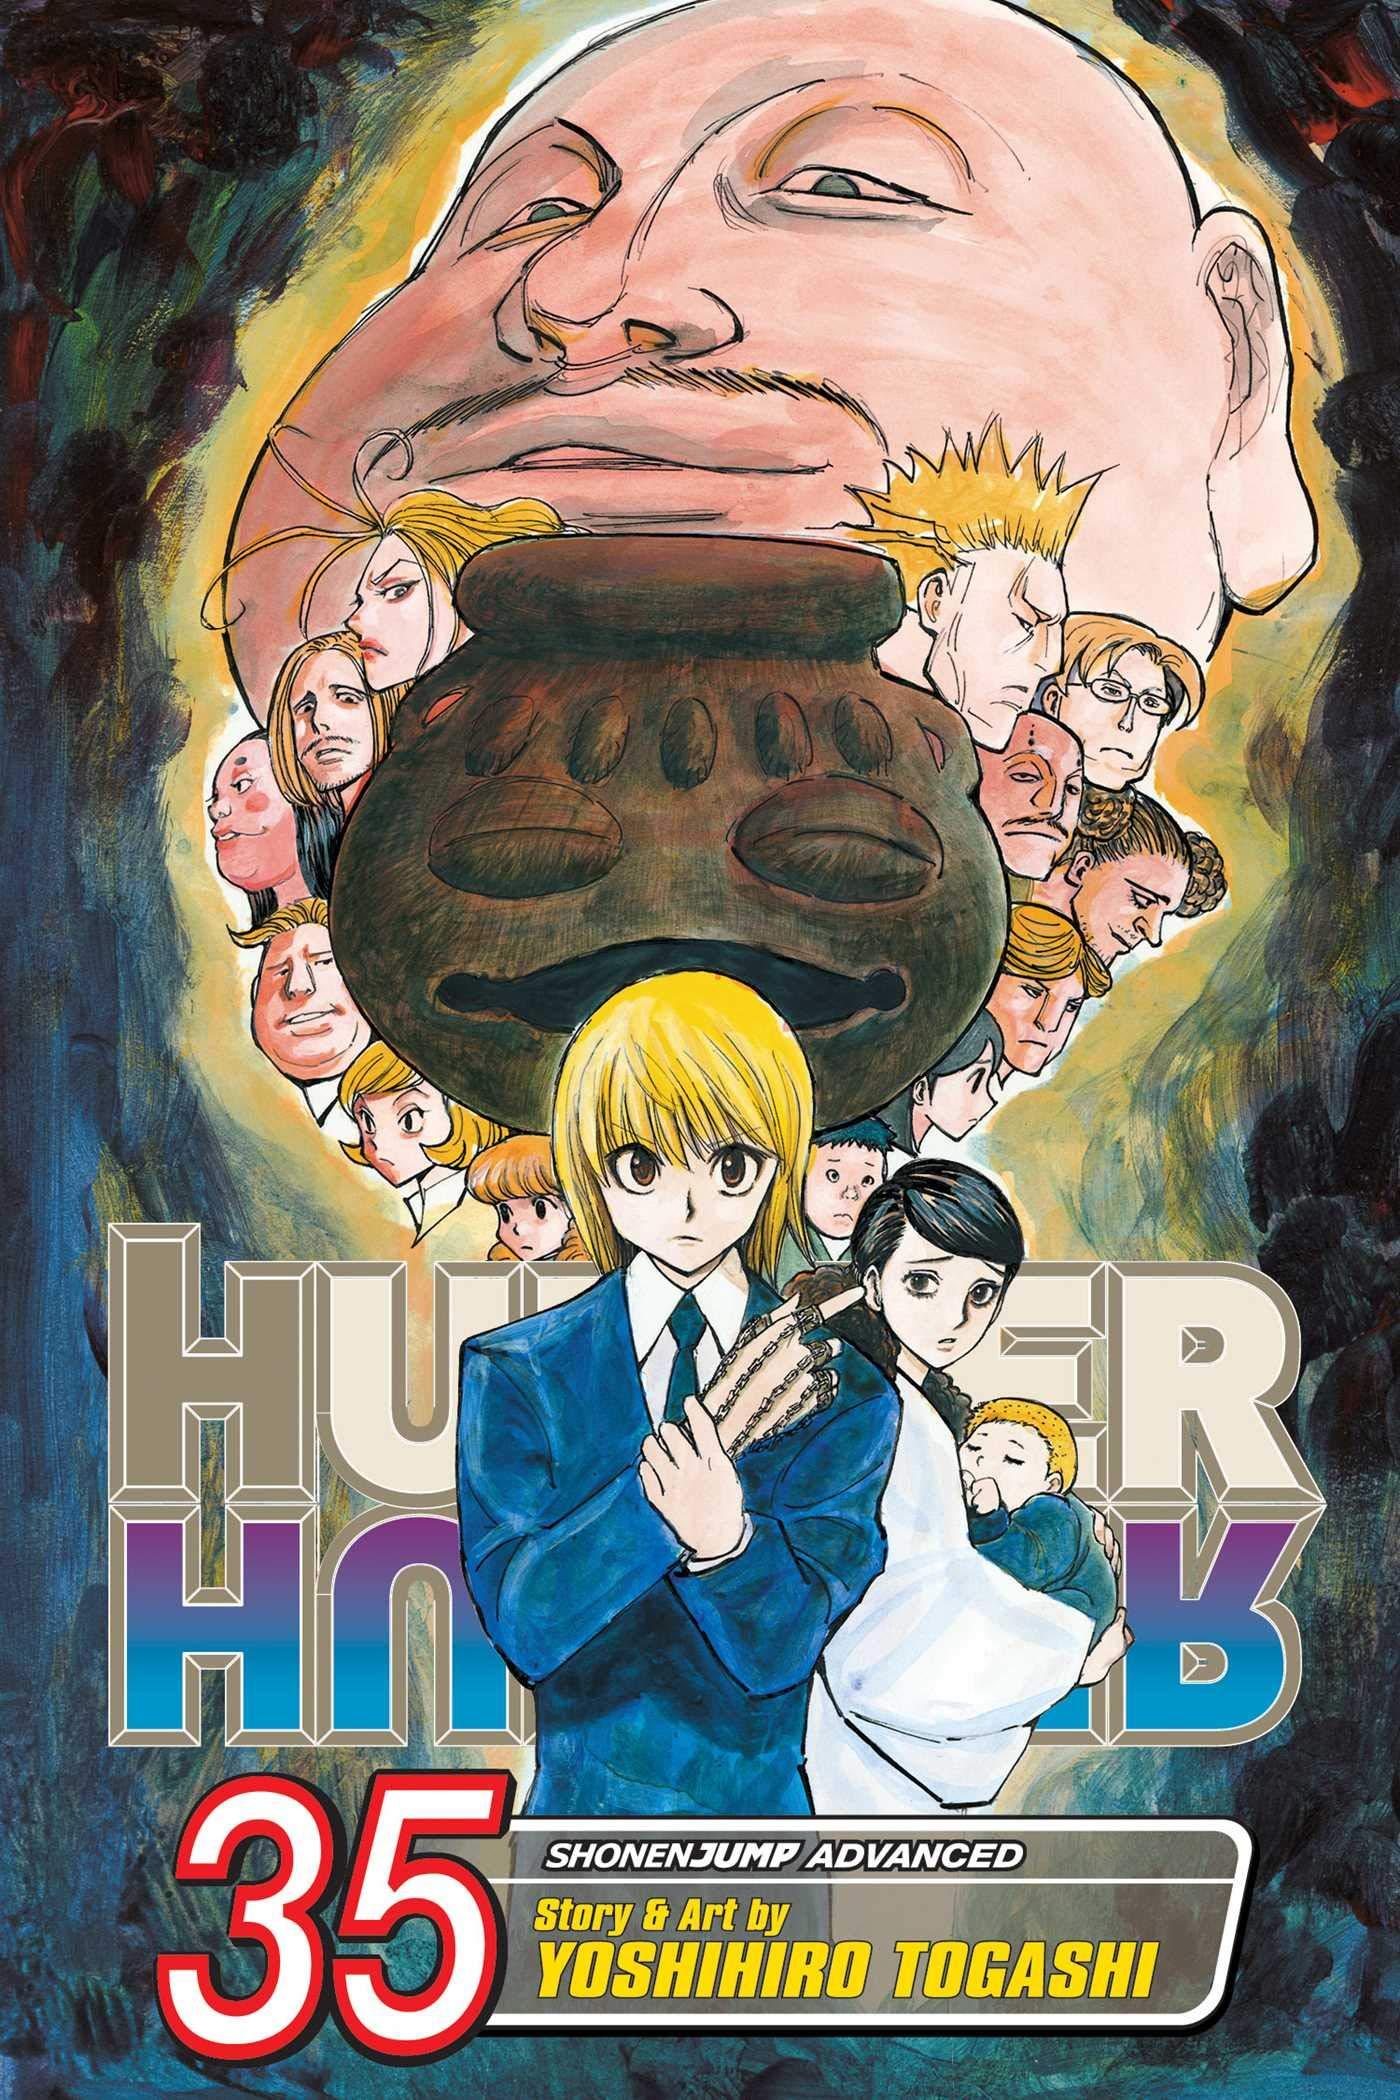 Hunter X Hunter Vol 35 35 Togashi Yoshihiro 9781974703067 Amazon Com Books